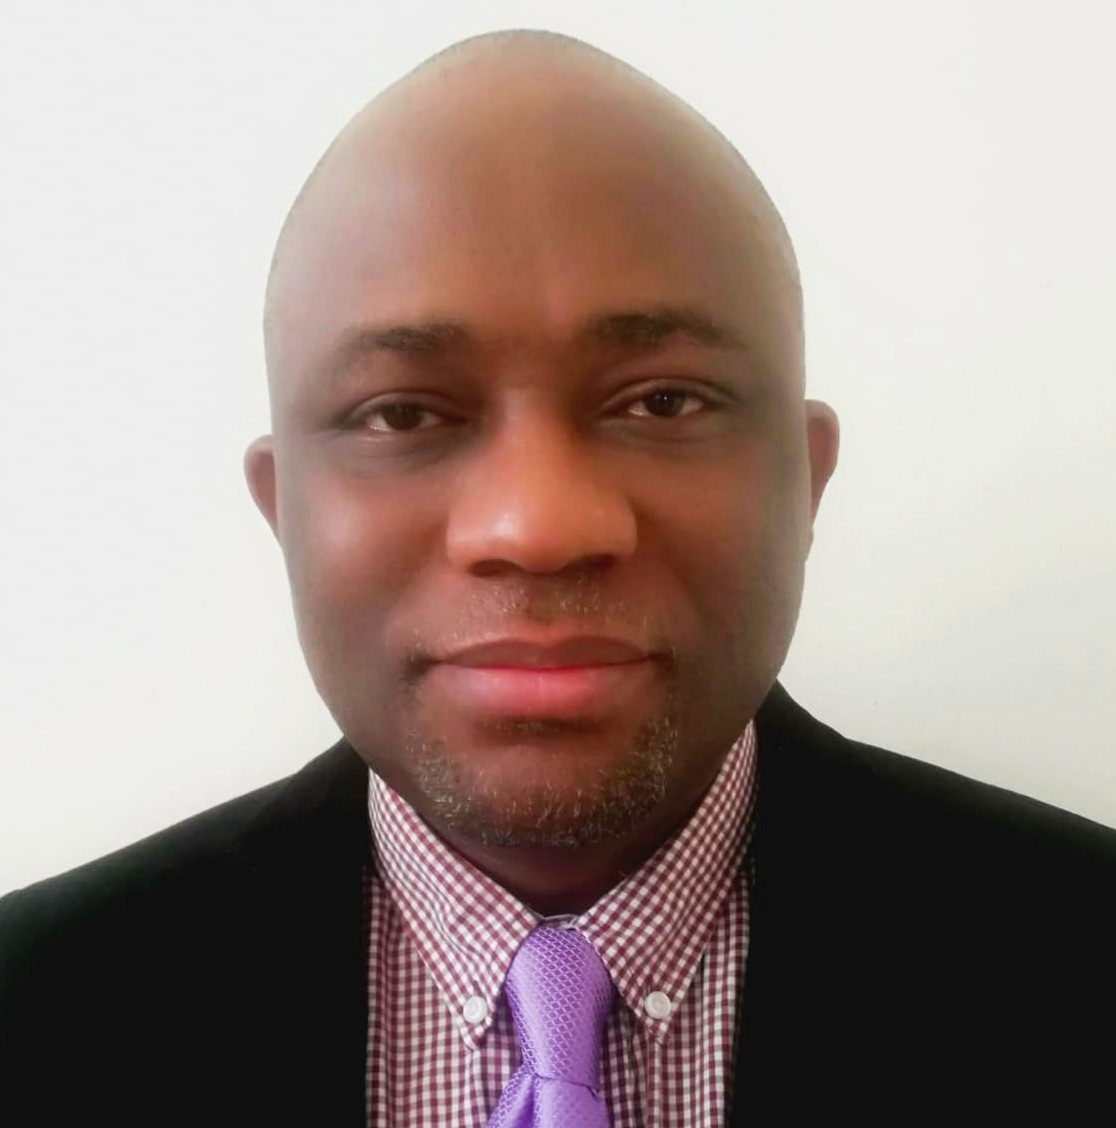 Dr. Okobi Ekpo